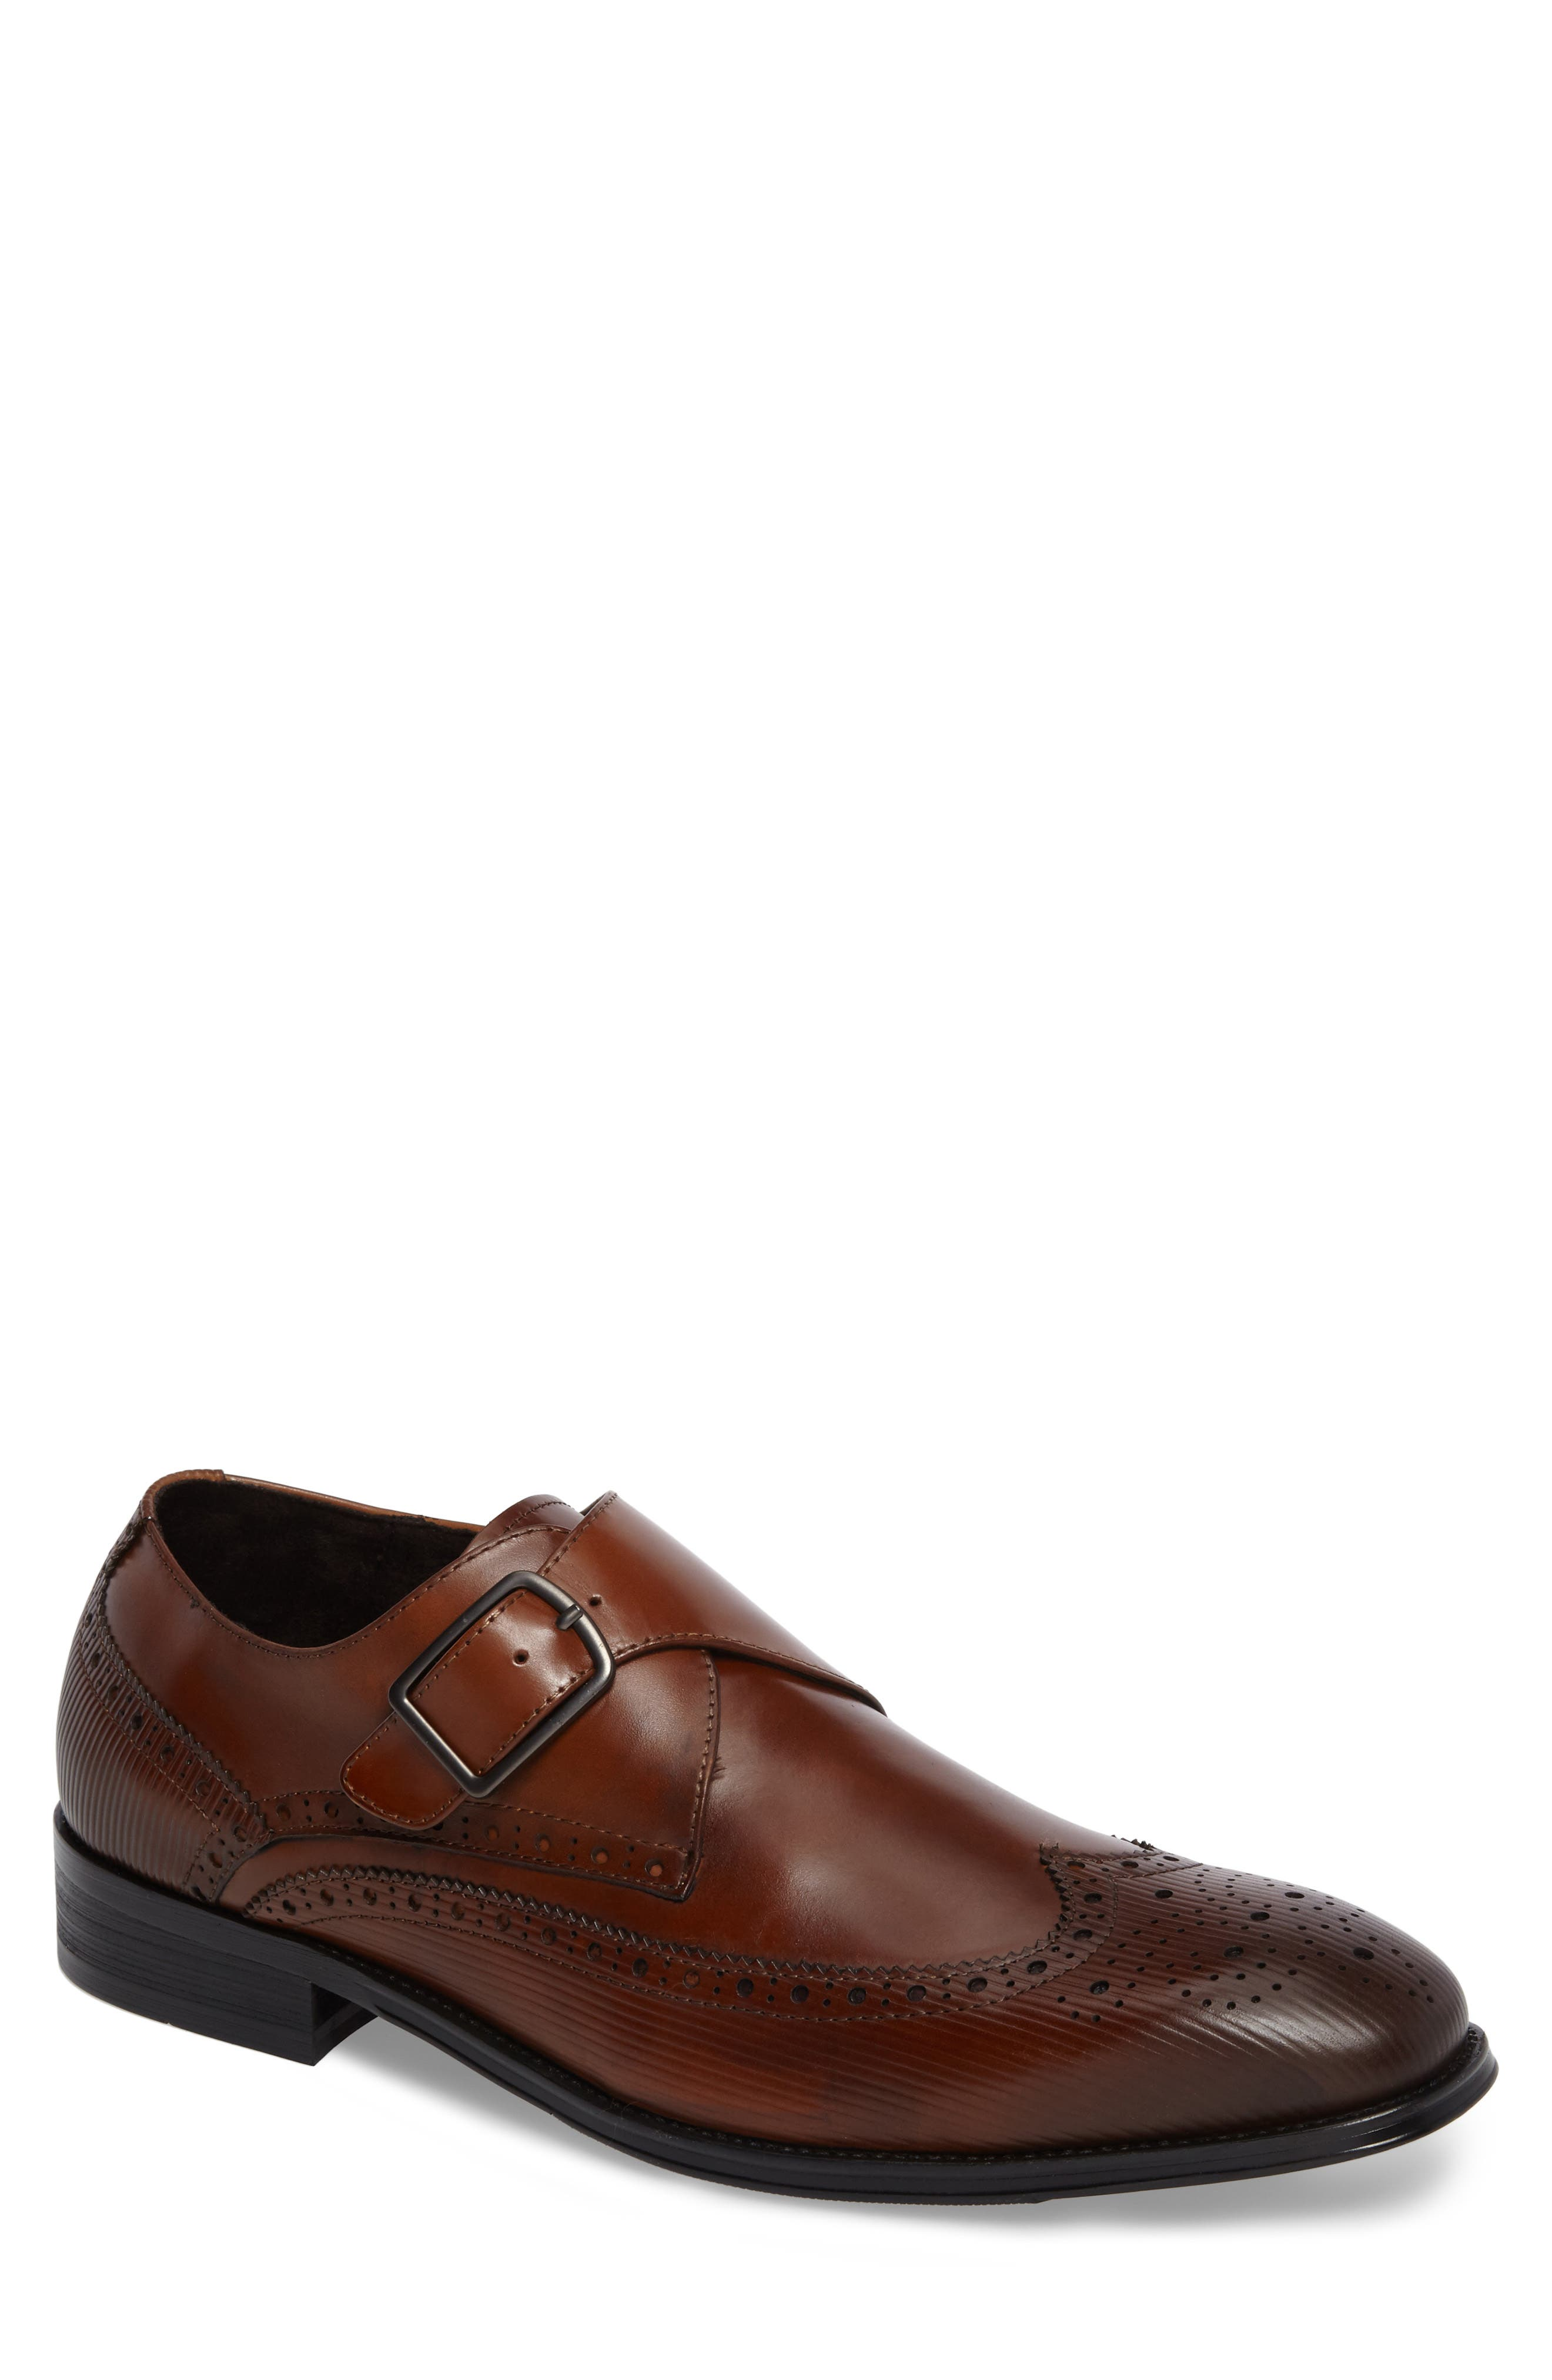 Kenneth Cole New York Design Monk Strap Shoe (Men)